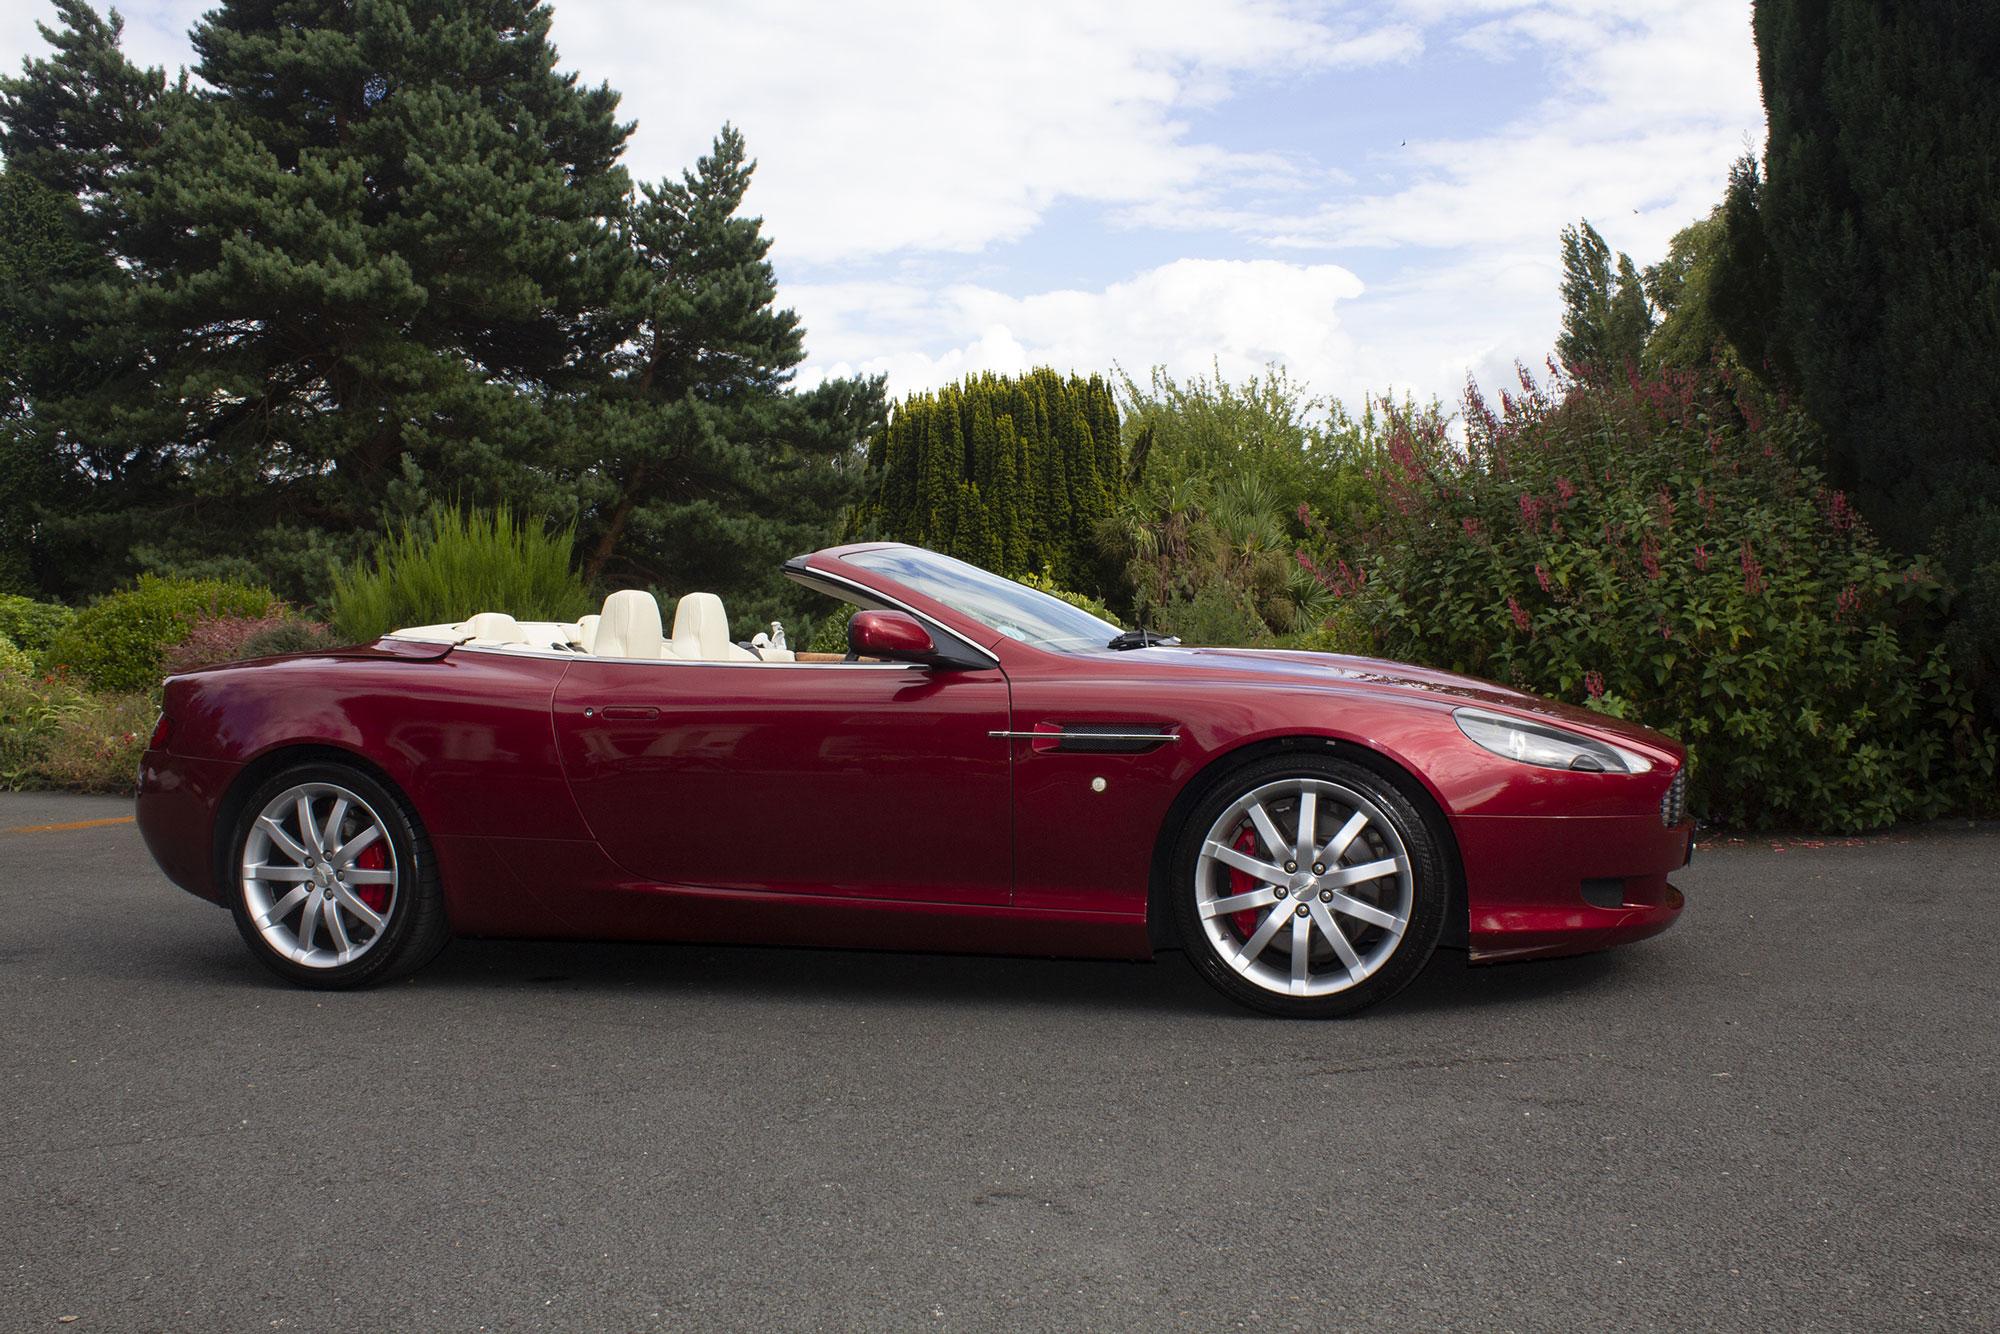 ridiculous rentals - luxury car hire dublin, ireland